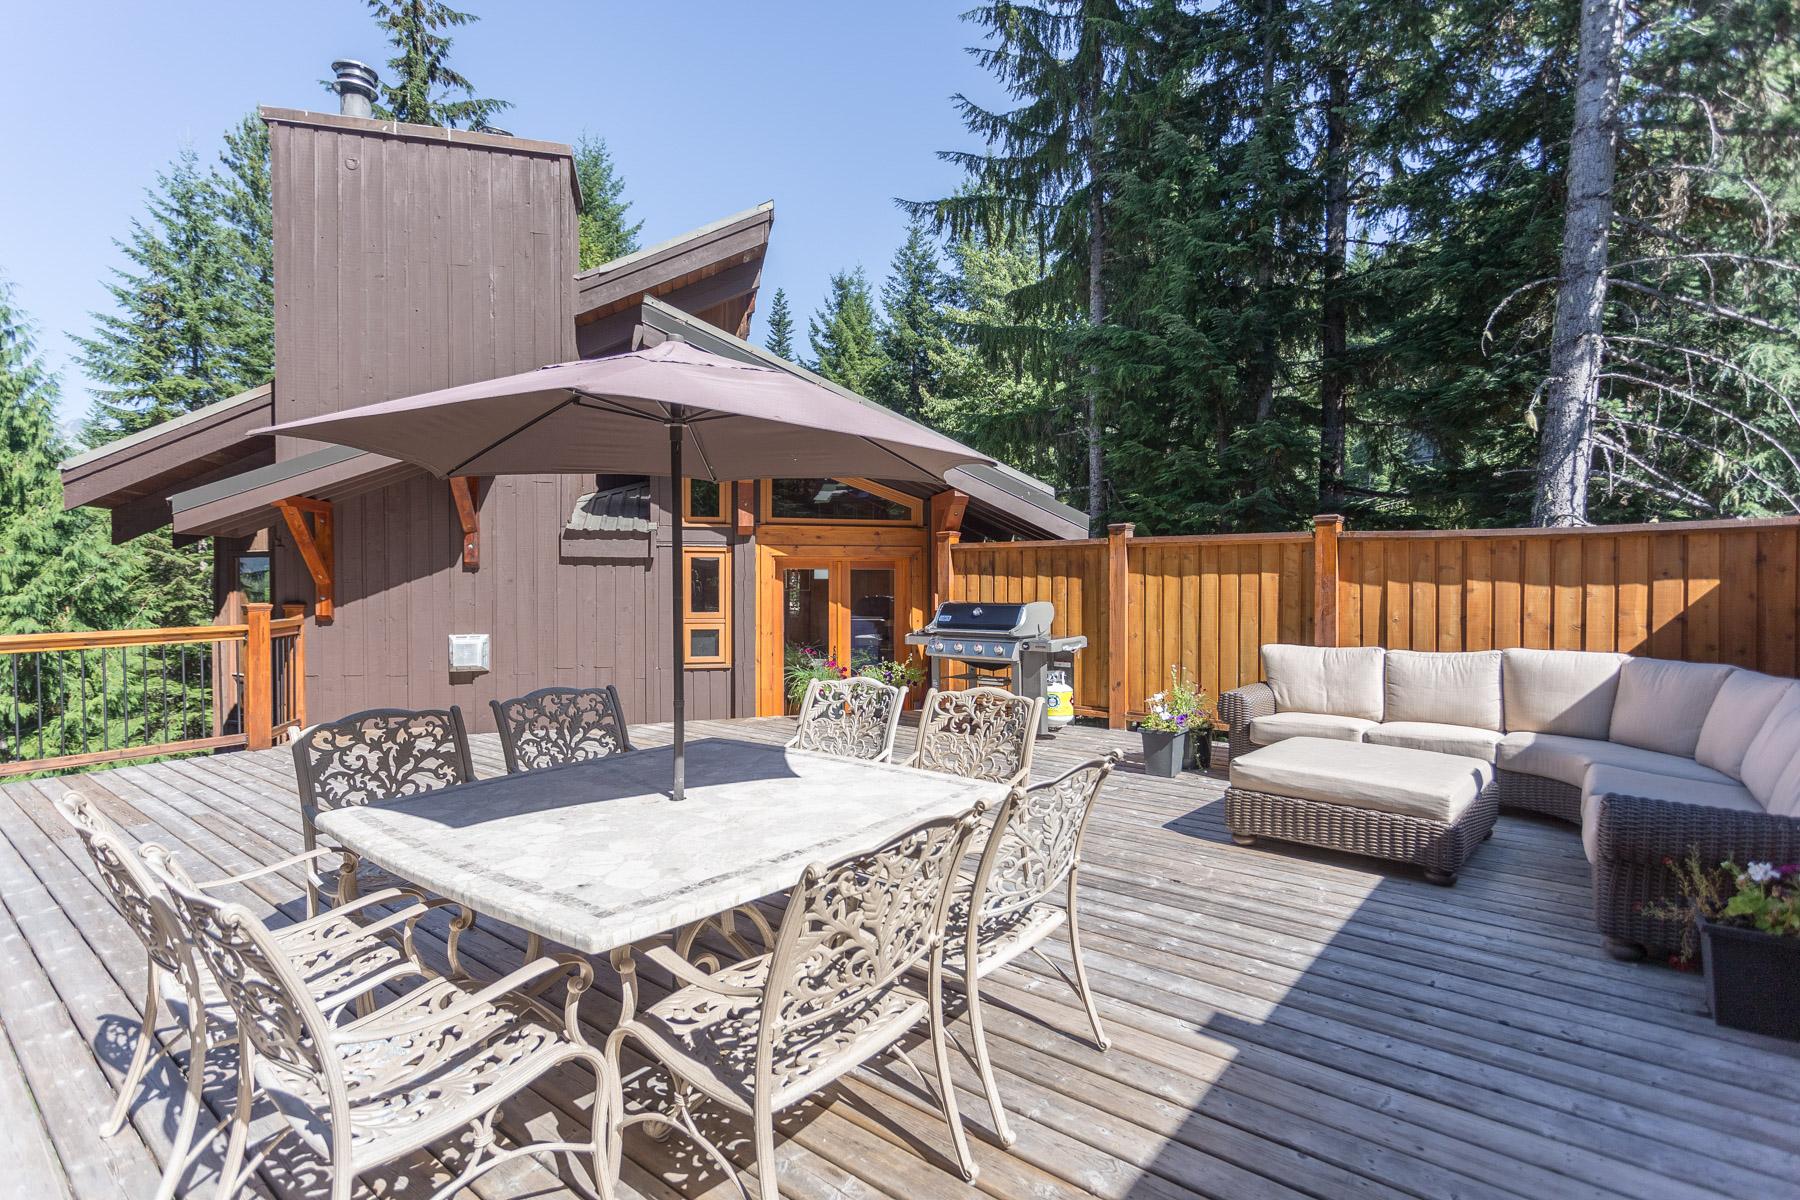 Copy of Aurora Lodge - Upper deck